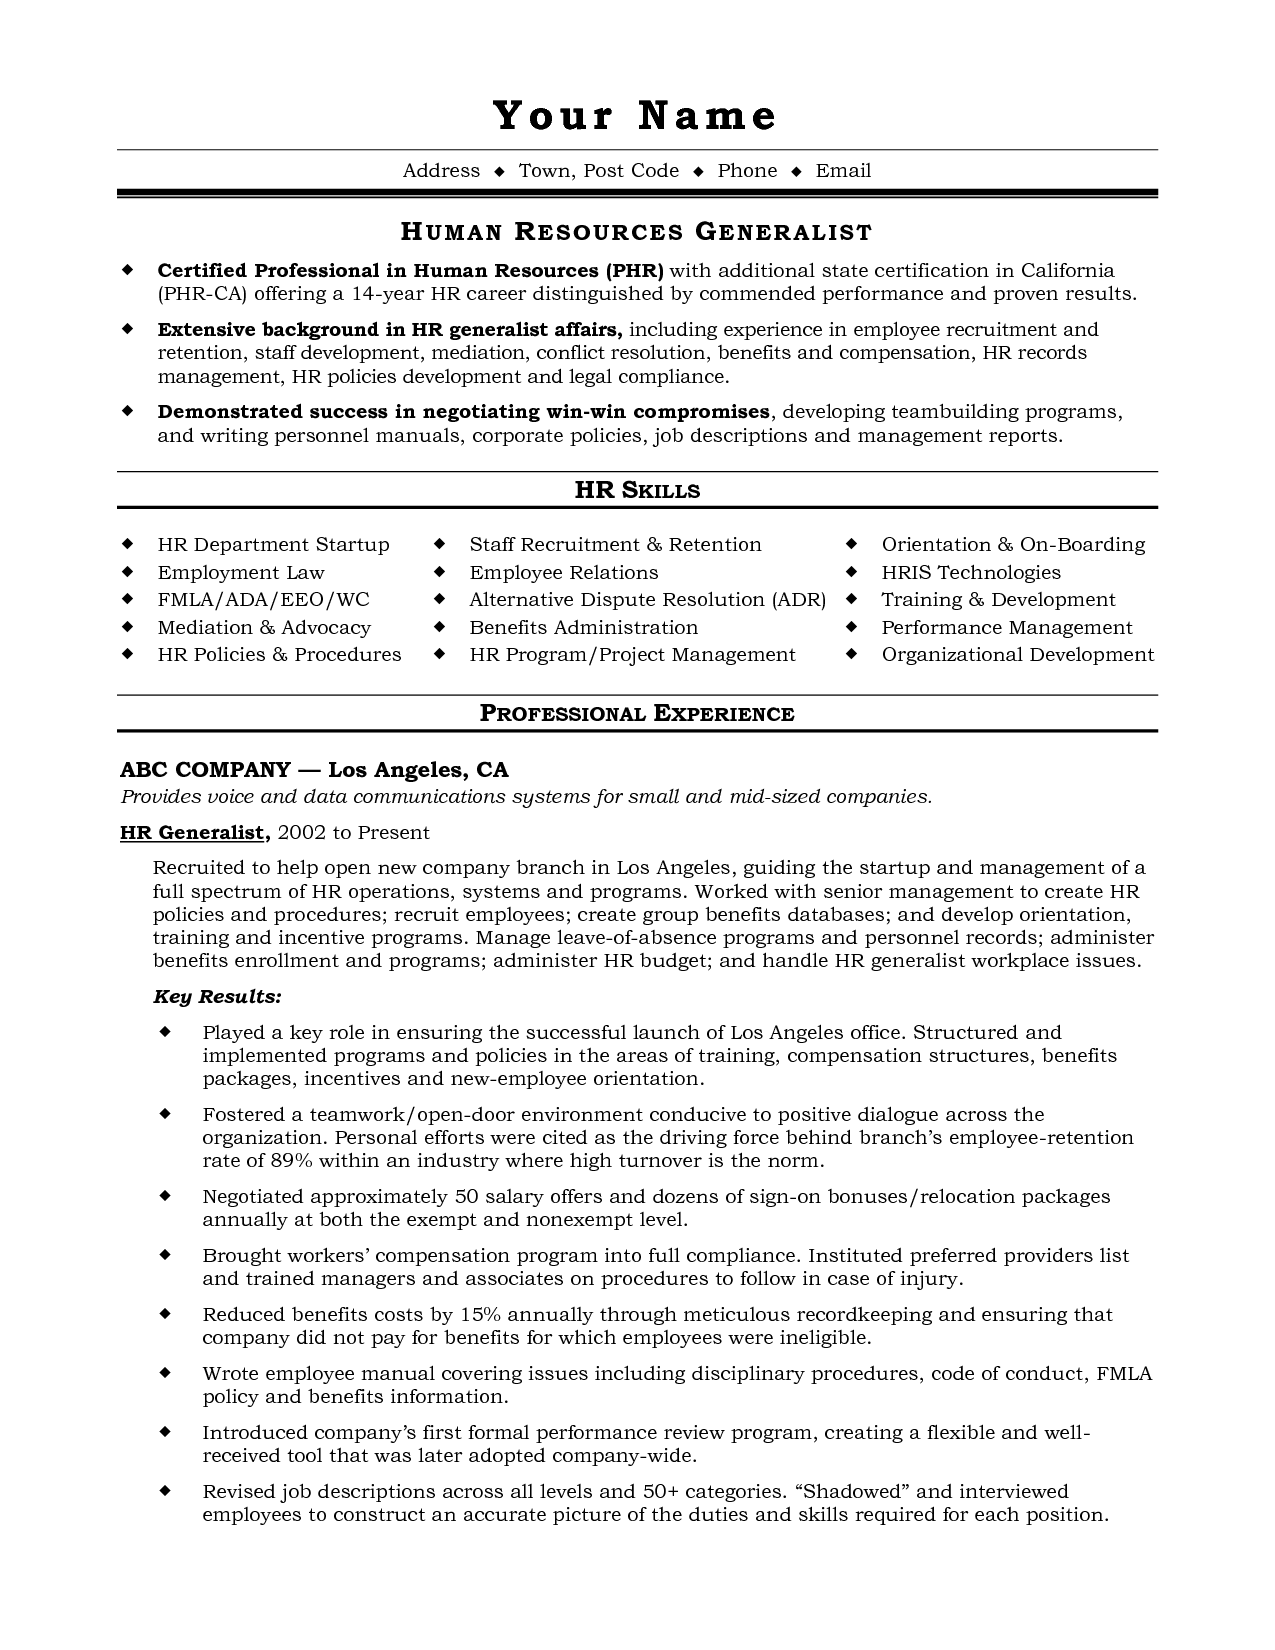 free resume templates human resources